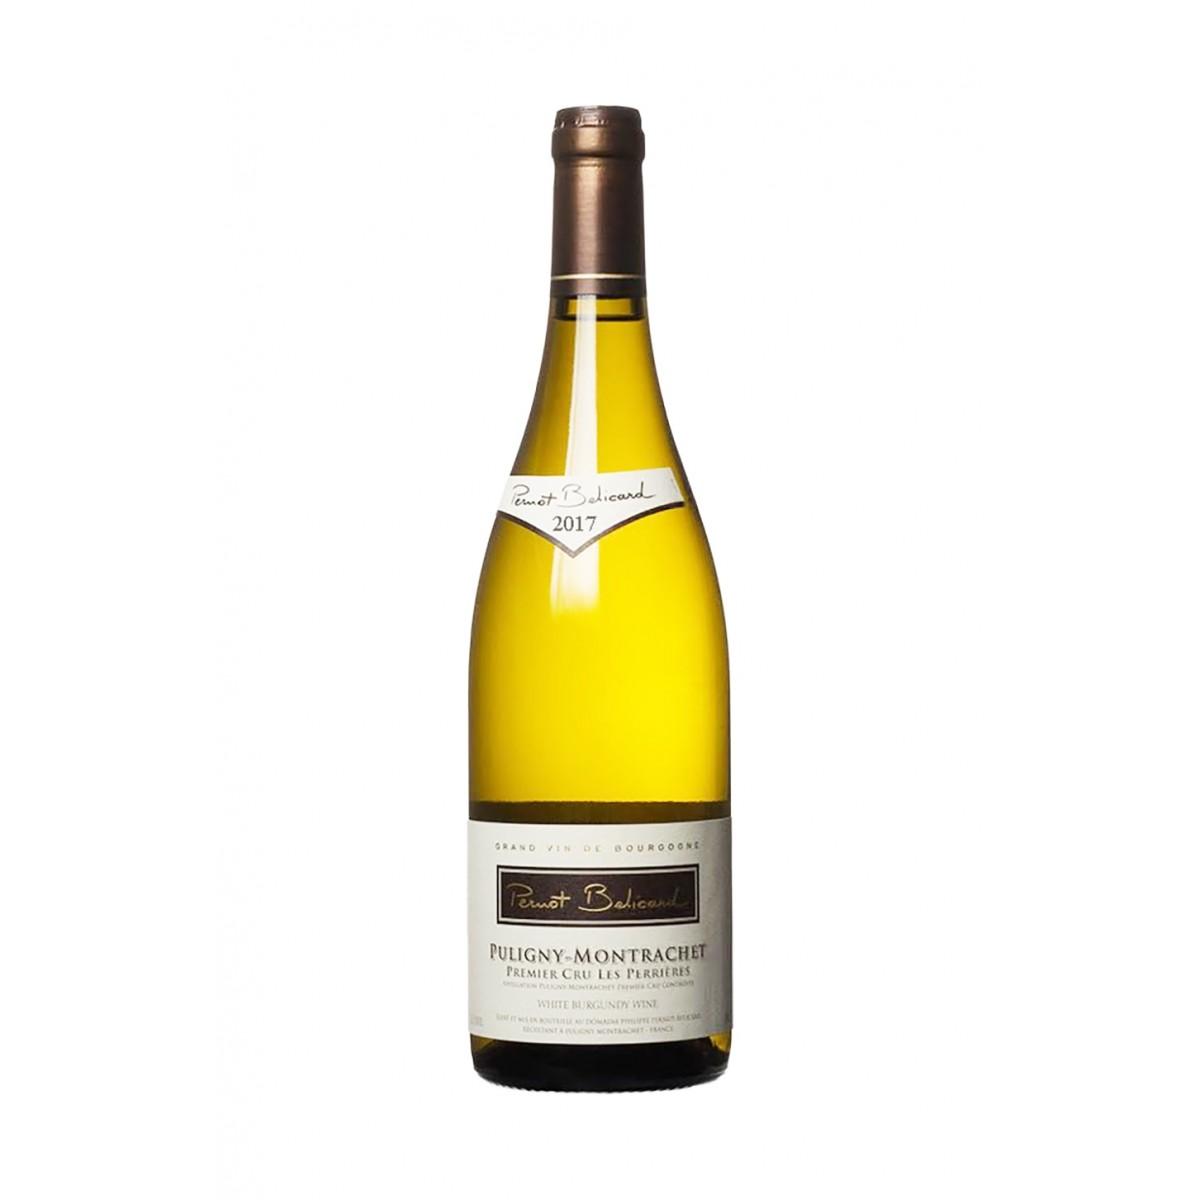 Puligny Montrachet 1er Cru Les Perrieres 2017 - Domaine Pernot Belicard